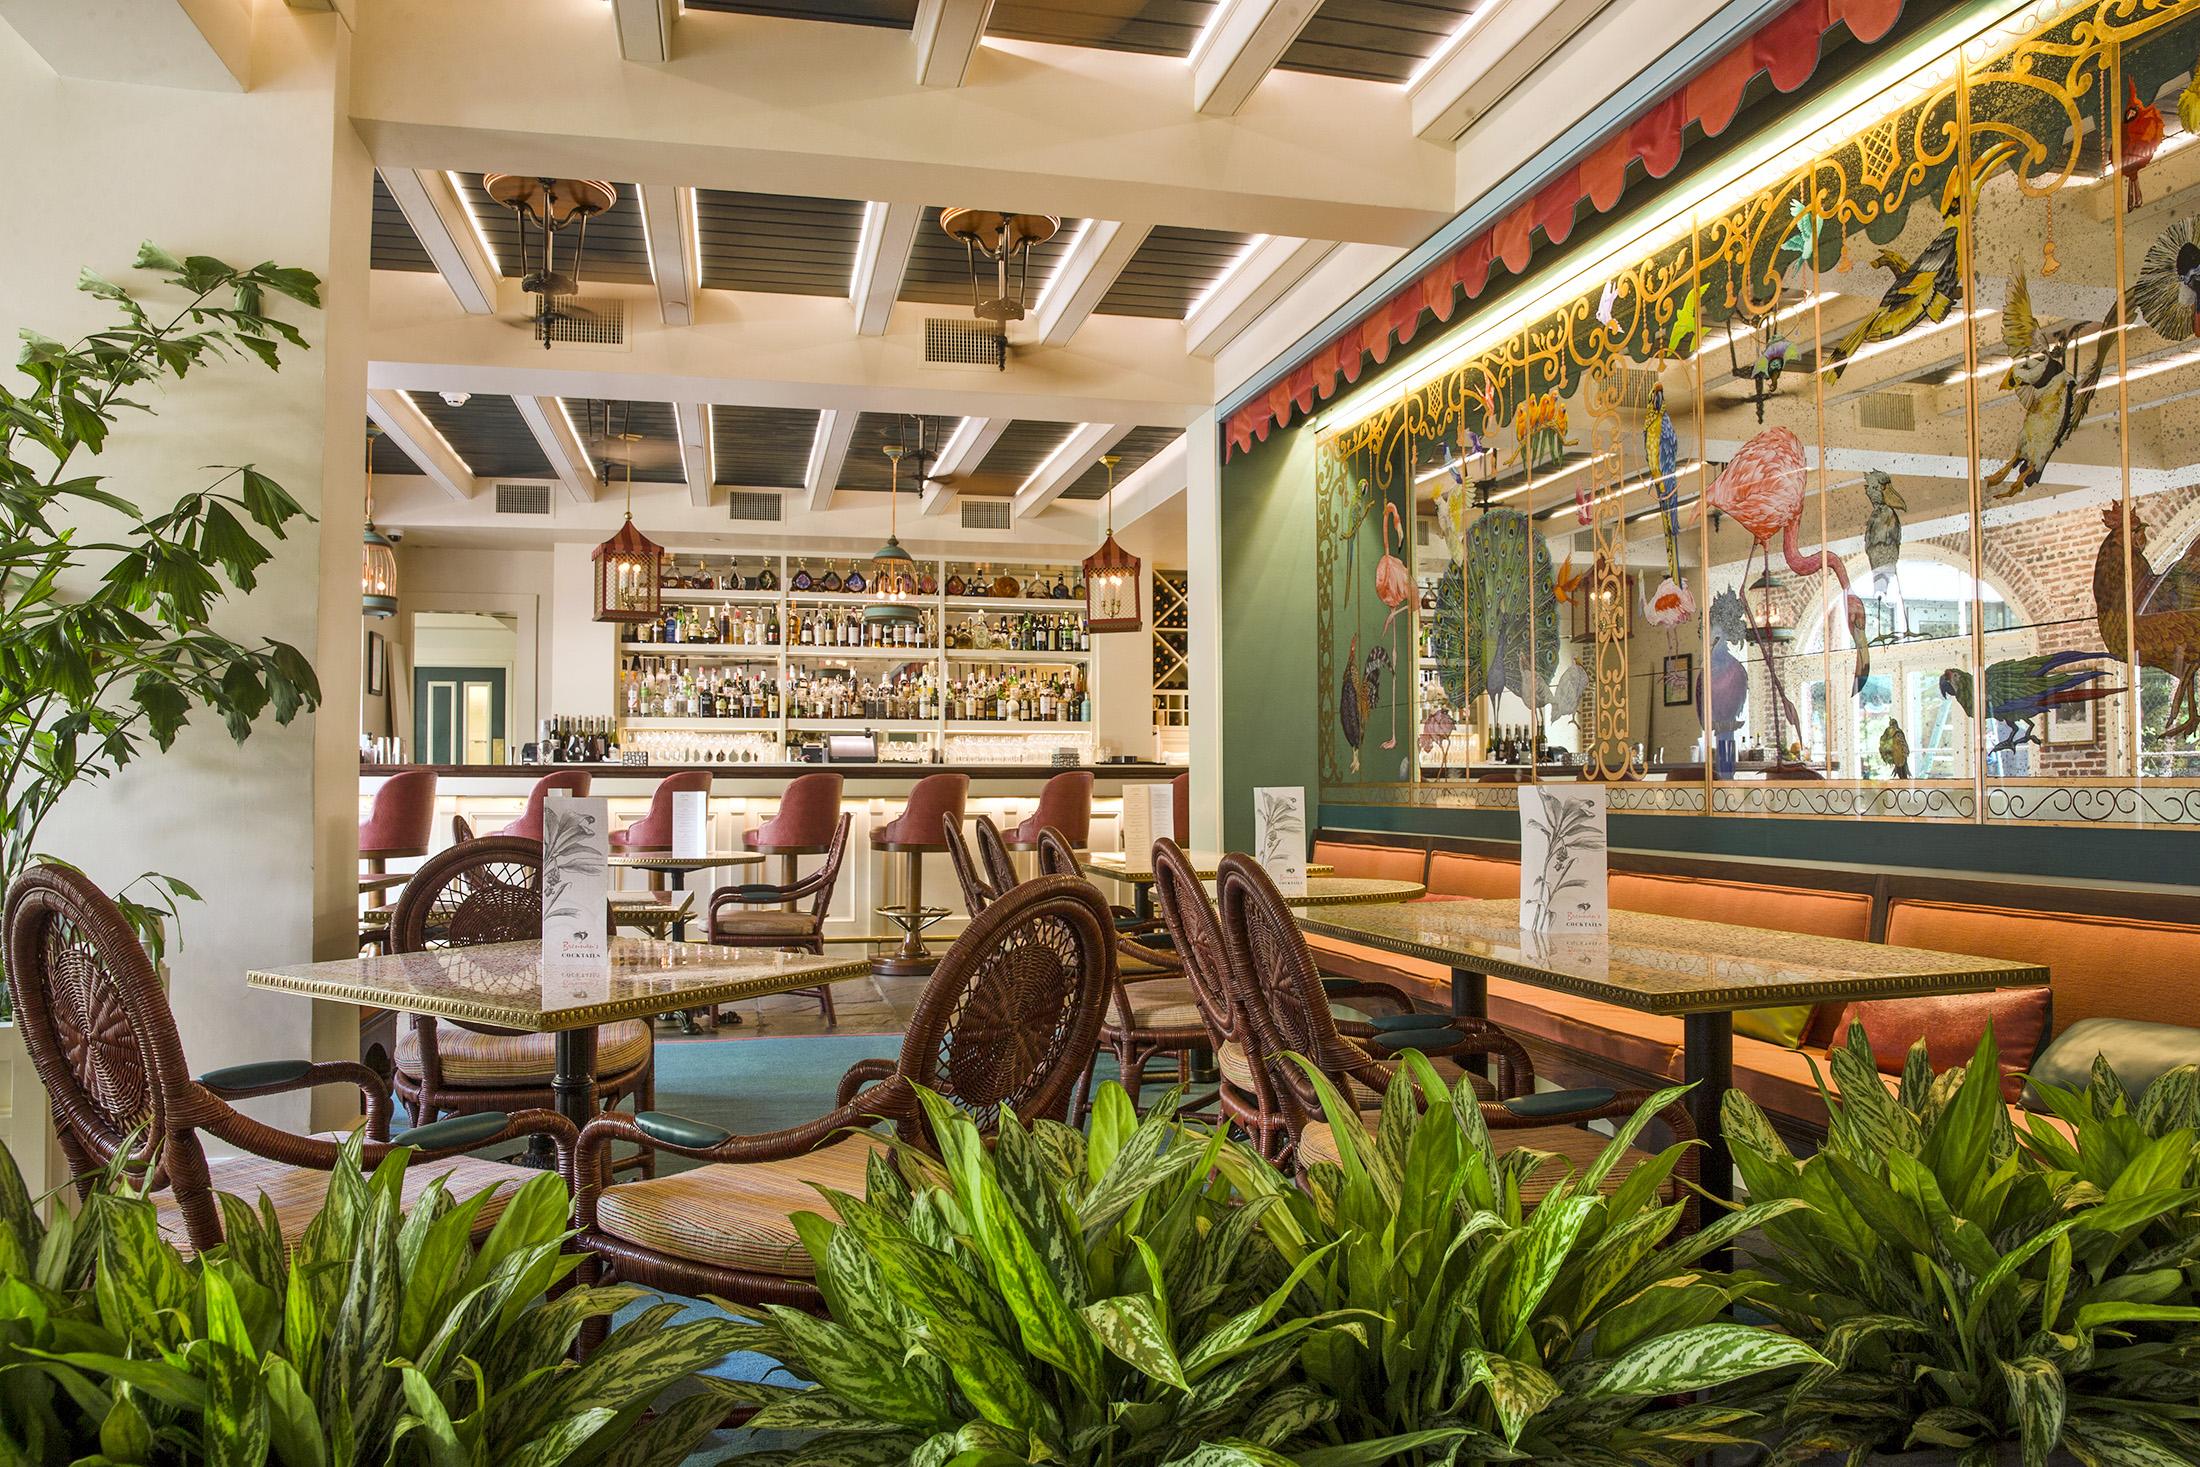 Brennan's - The Roost Bar